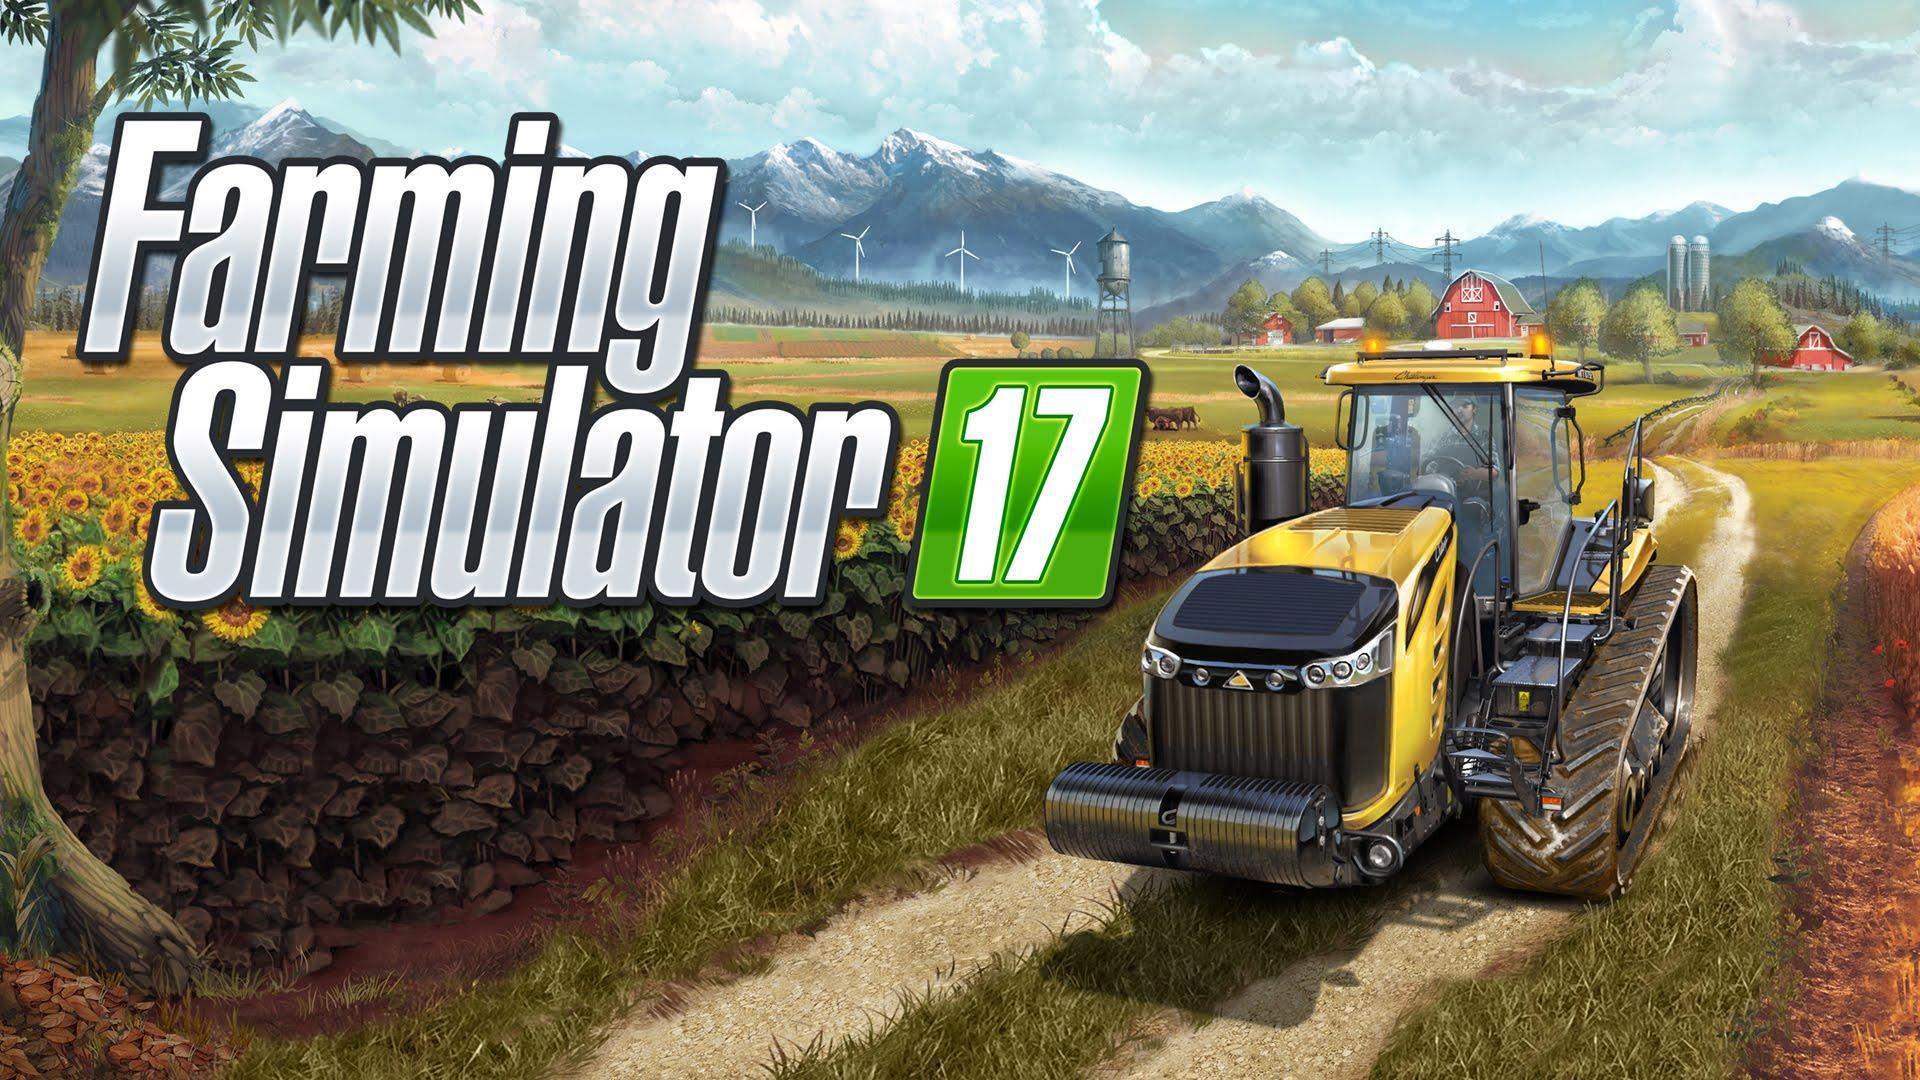 Farming Simulator 17 Free Downloadfree full pc game for download